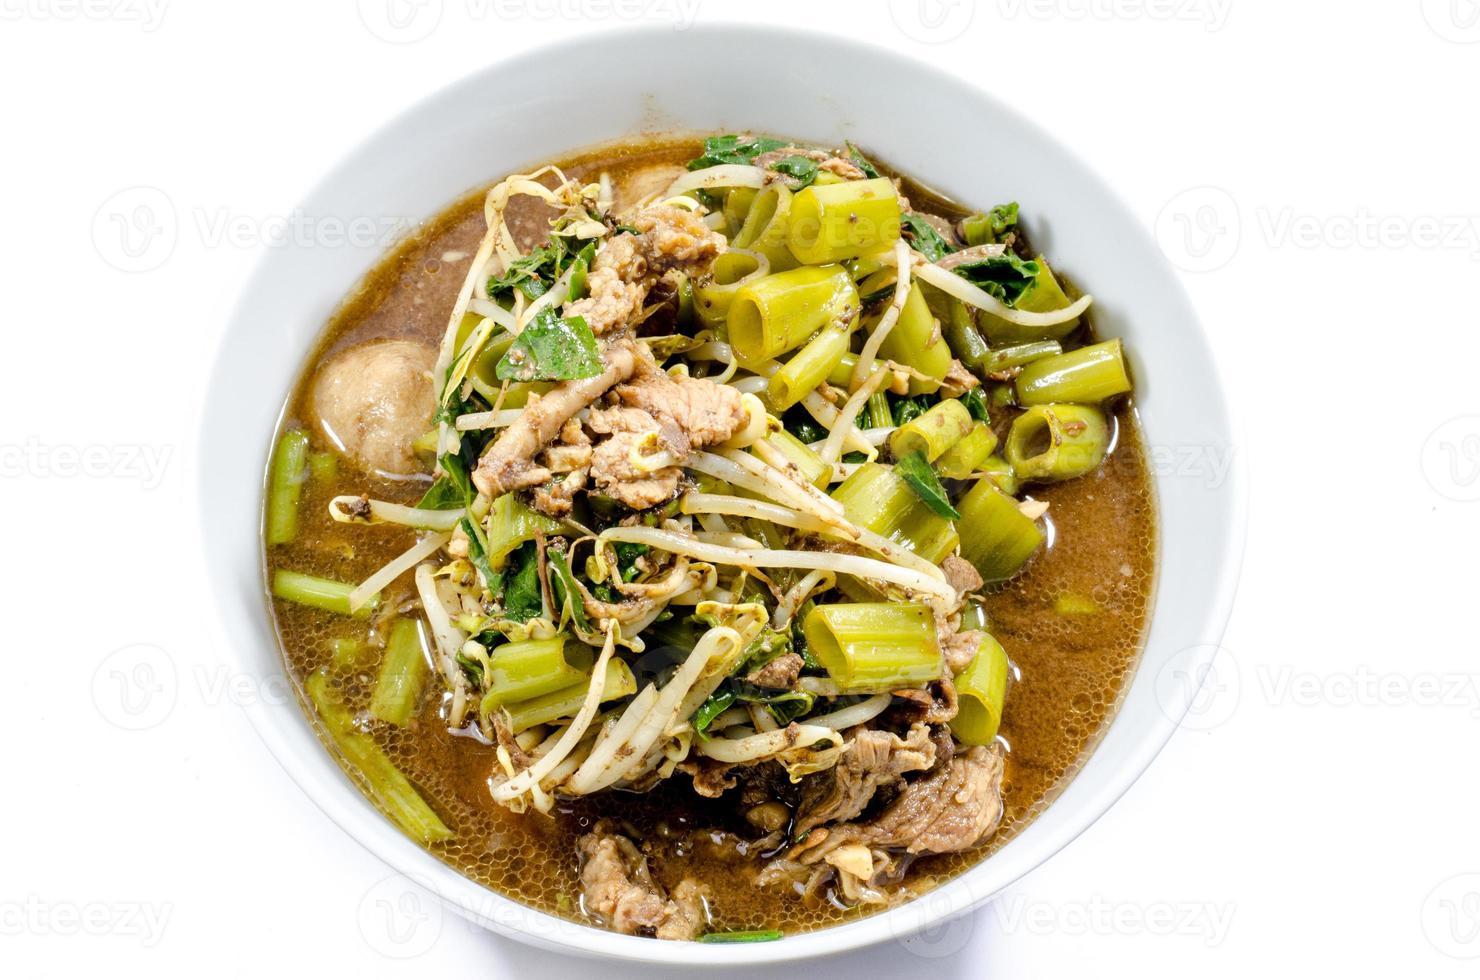 carne de fideos tailandeses foto